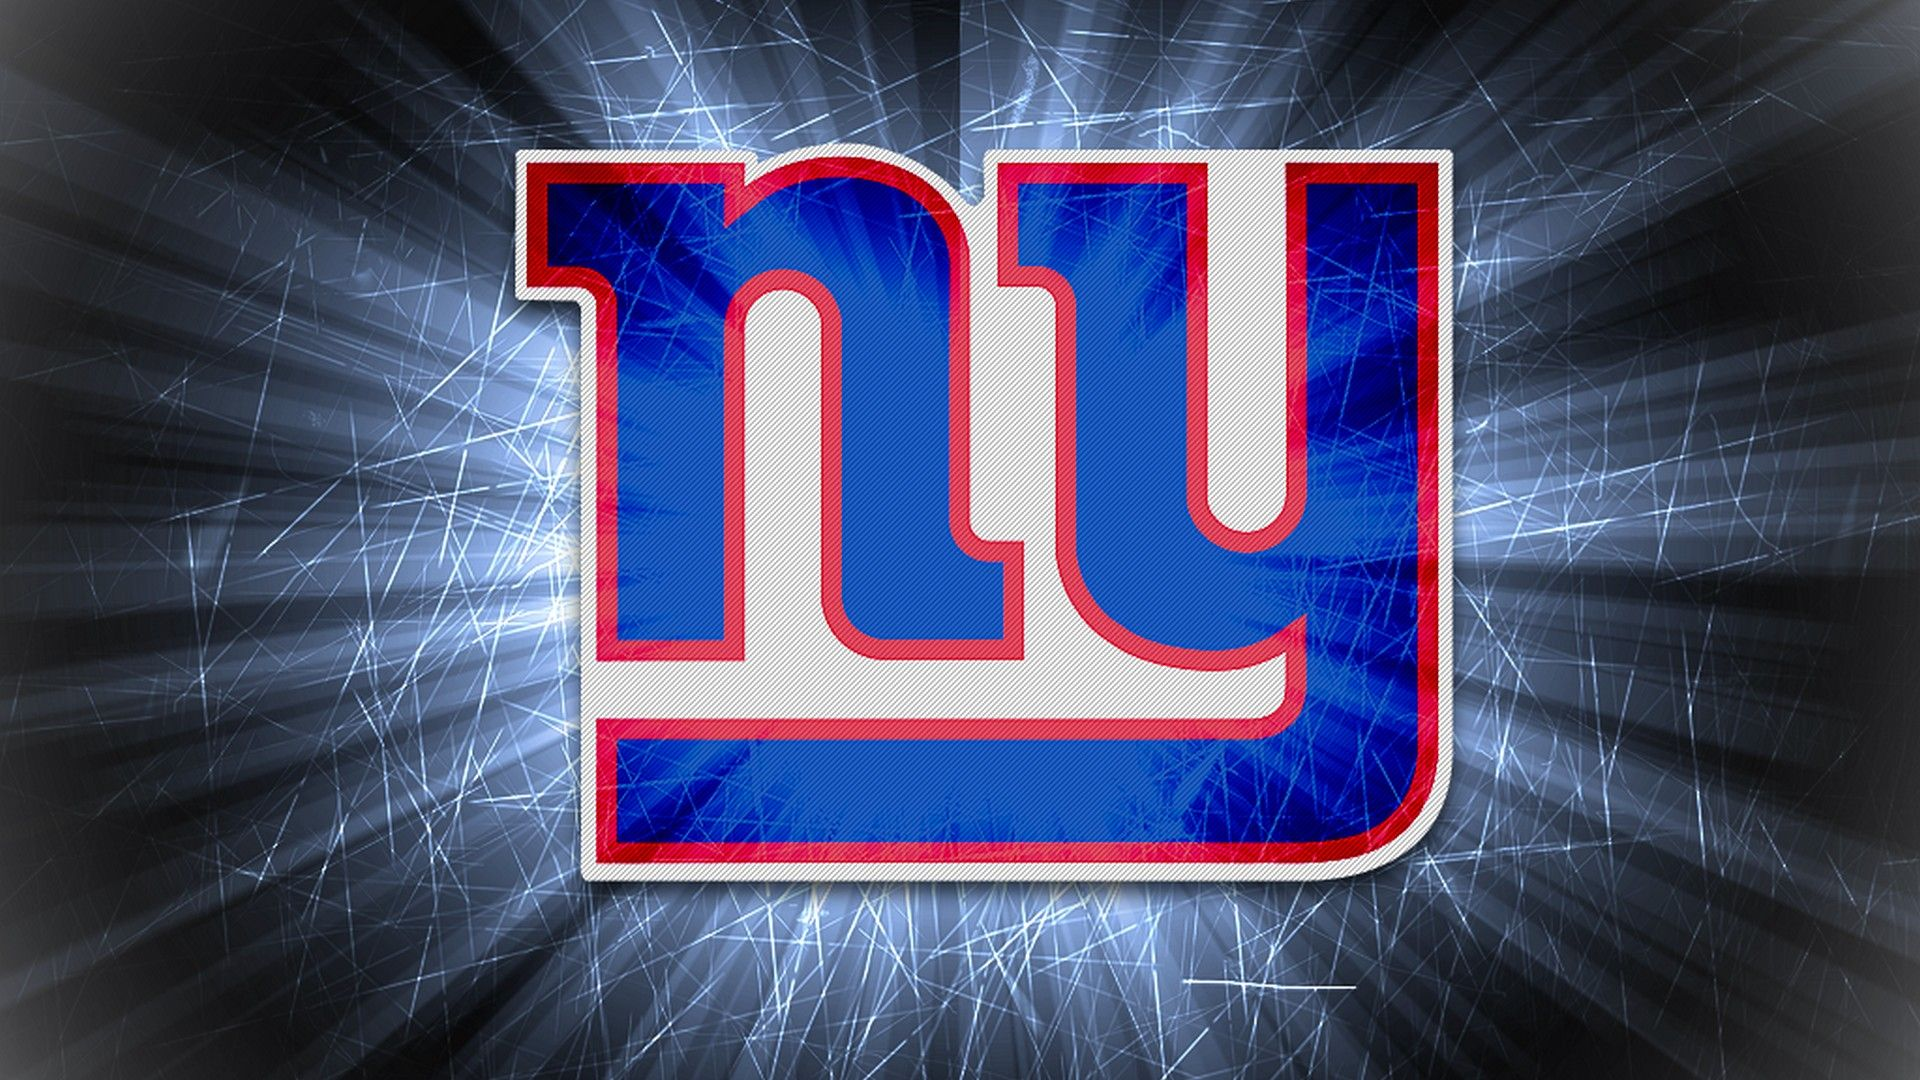 New York Giants Hd Wallpapers 2020 Nfl Football Wallpapers New York Giants New York Giants Logo New York Giants Jersey